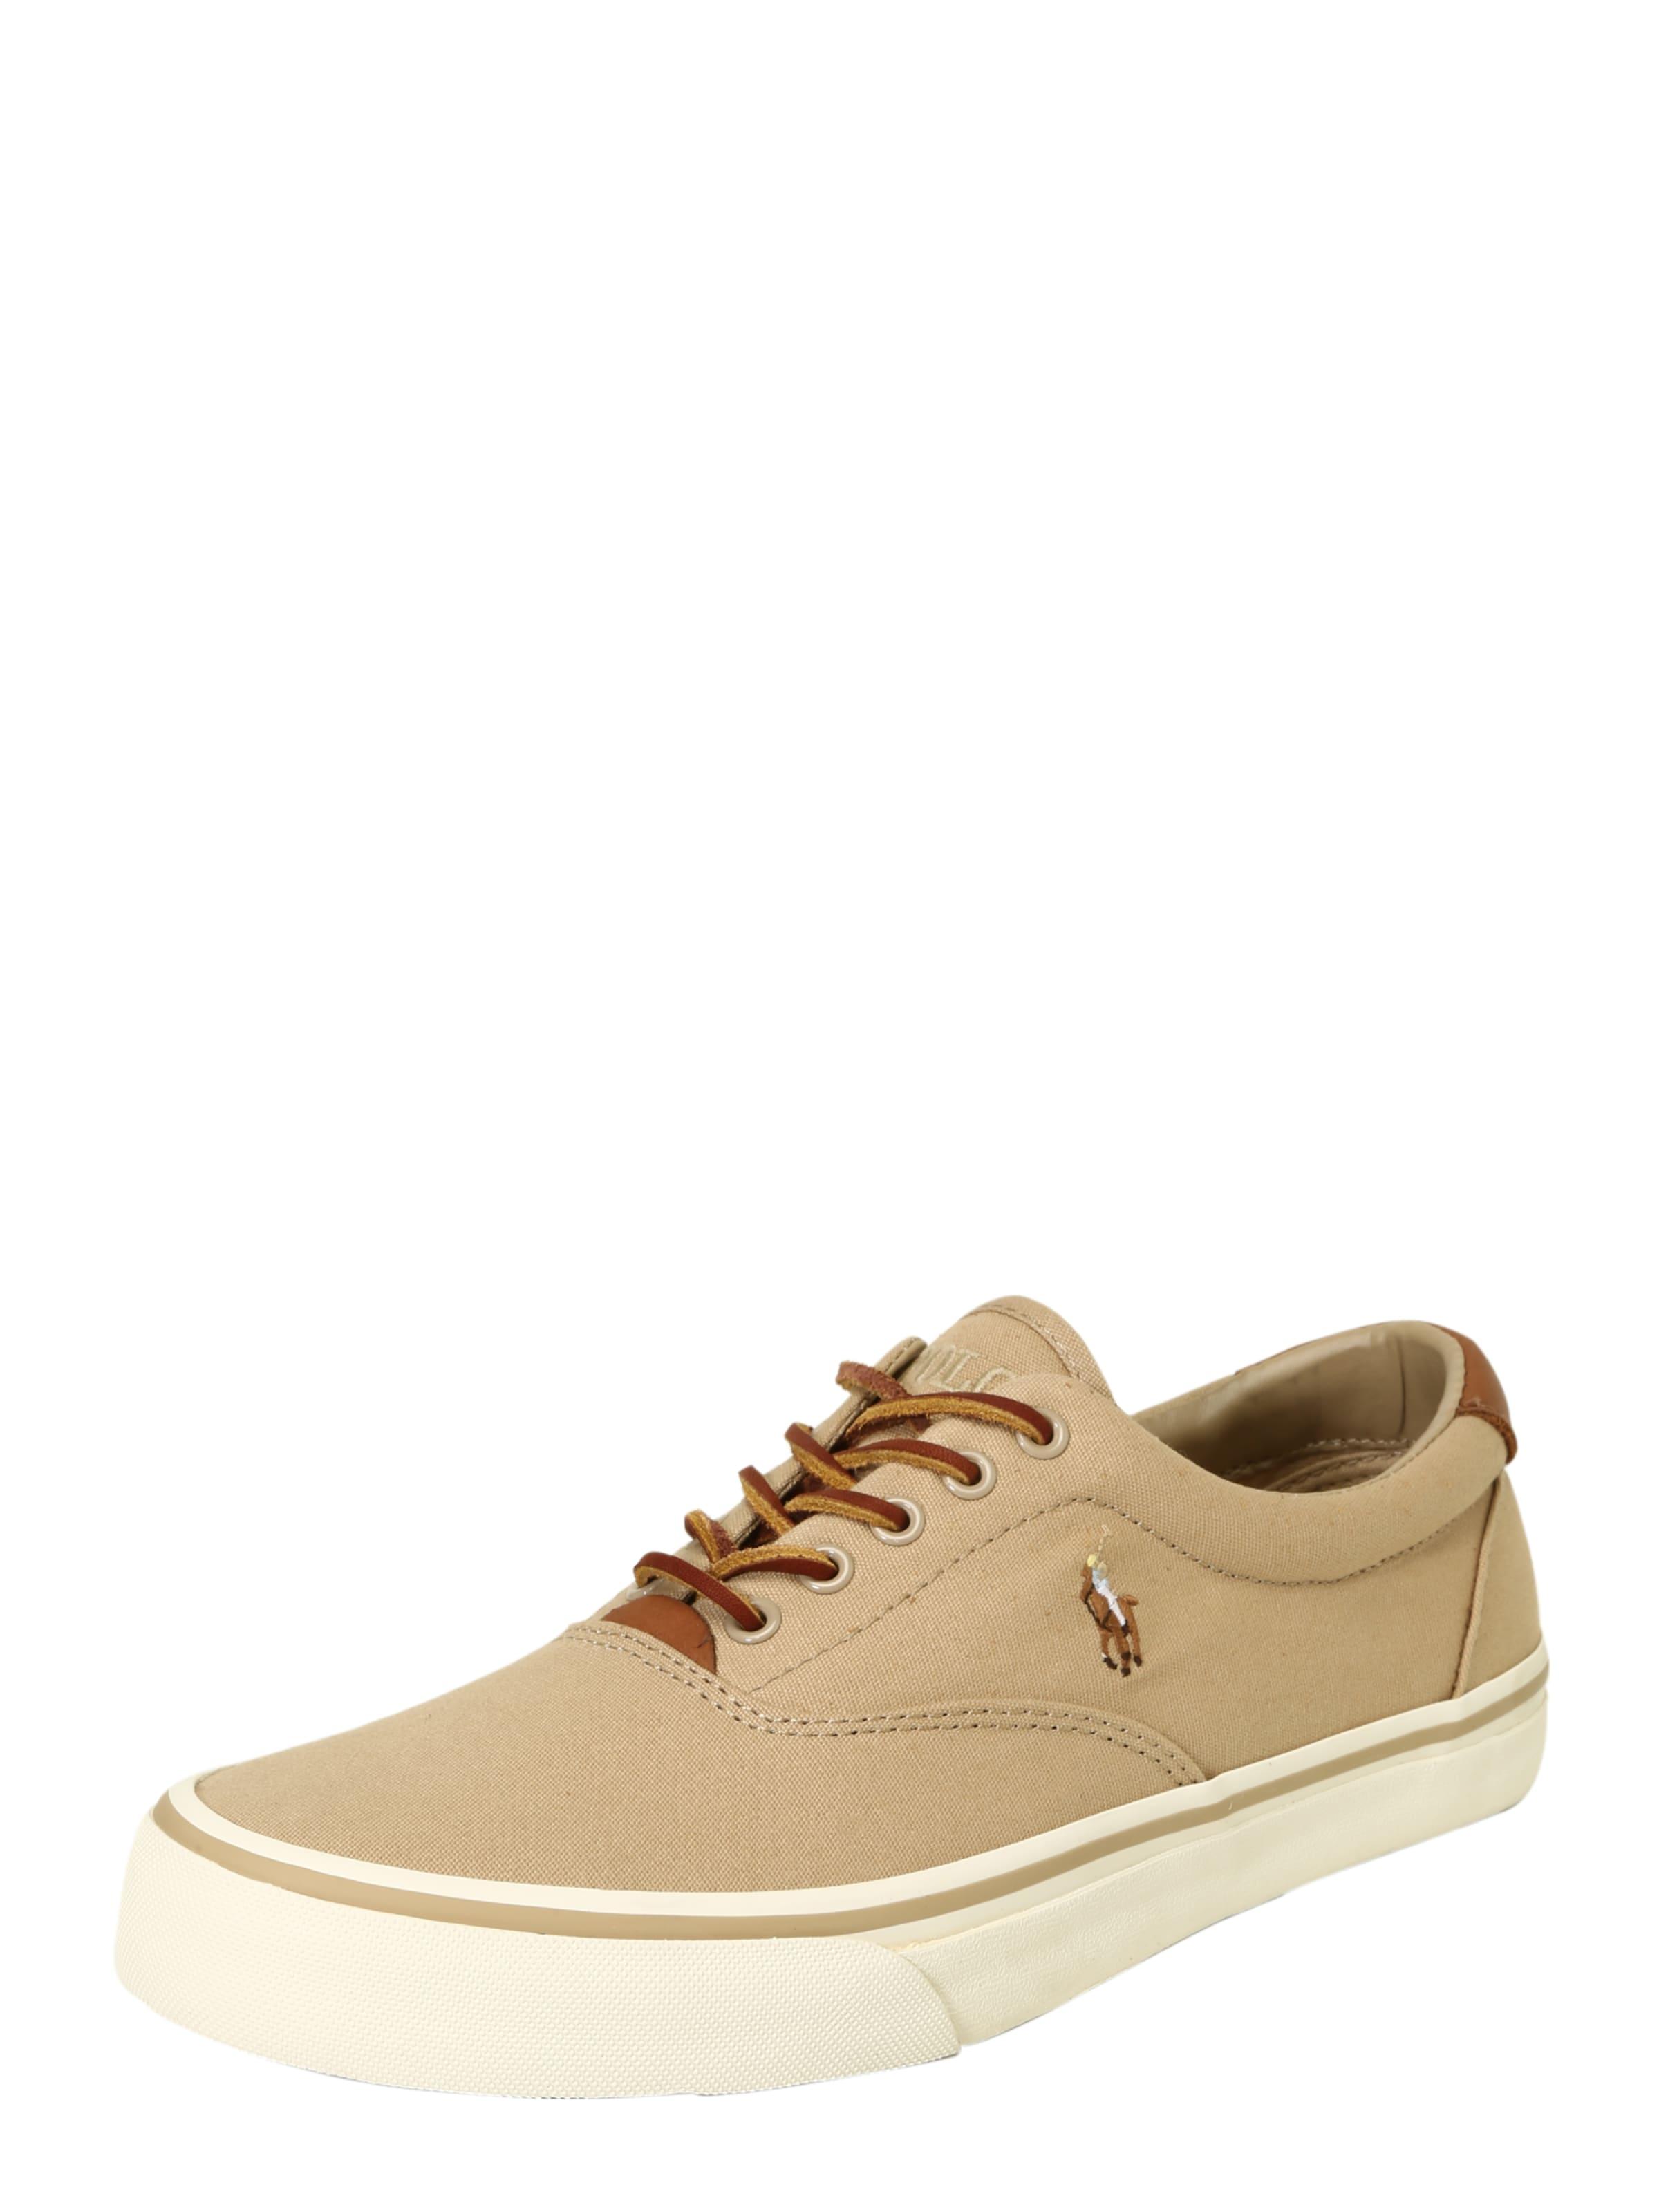 POLO RALPH LAUREN Sneaker THORTON Hohe Qualität